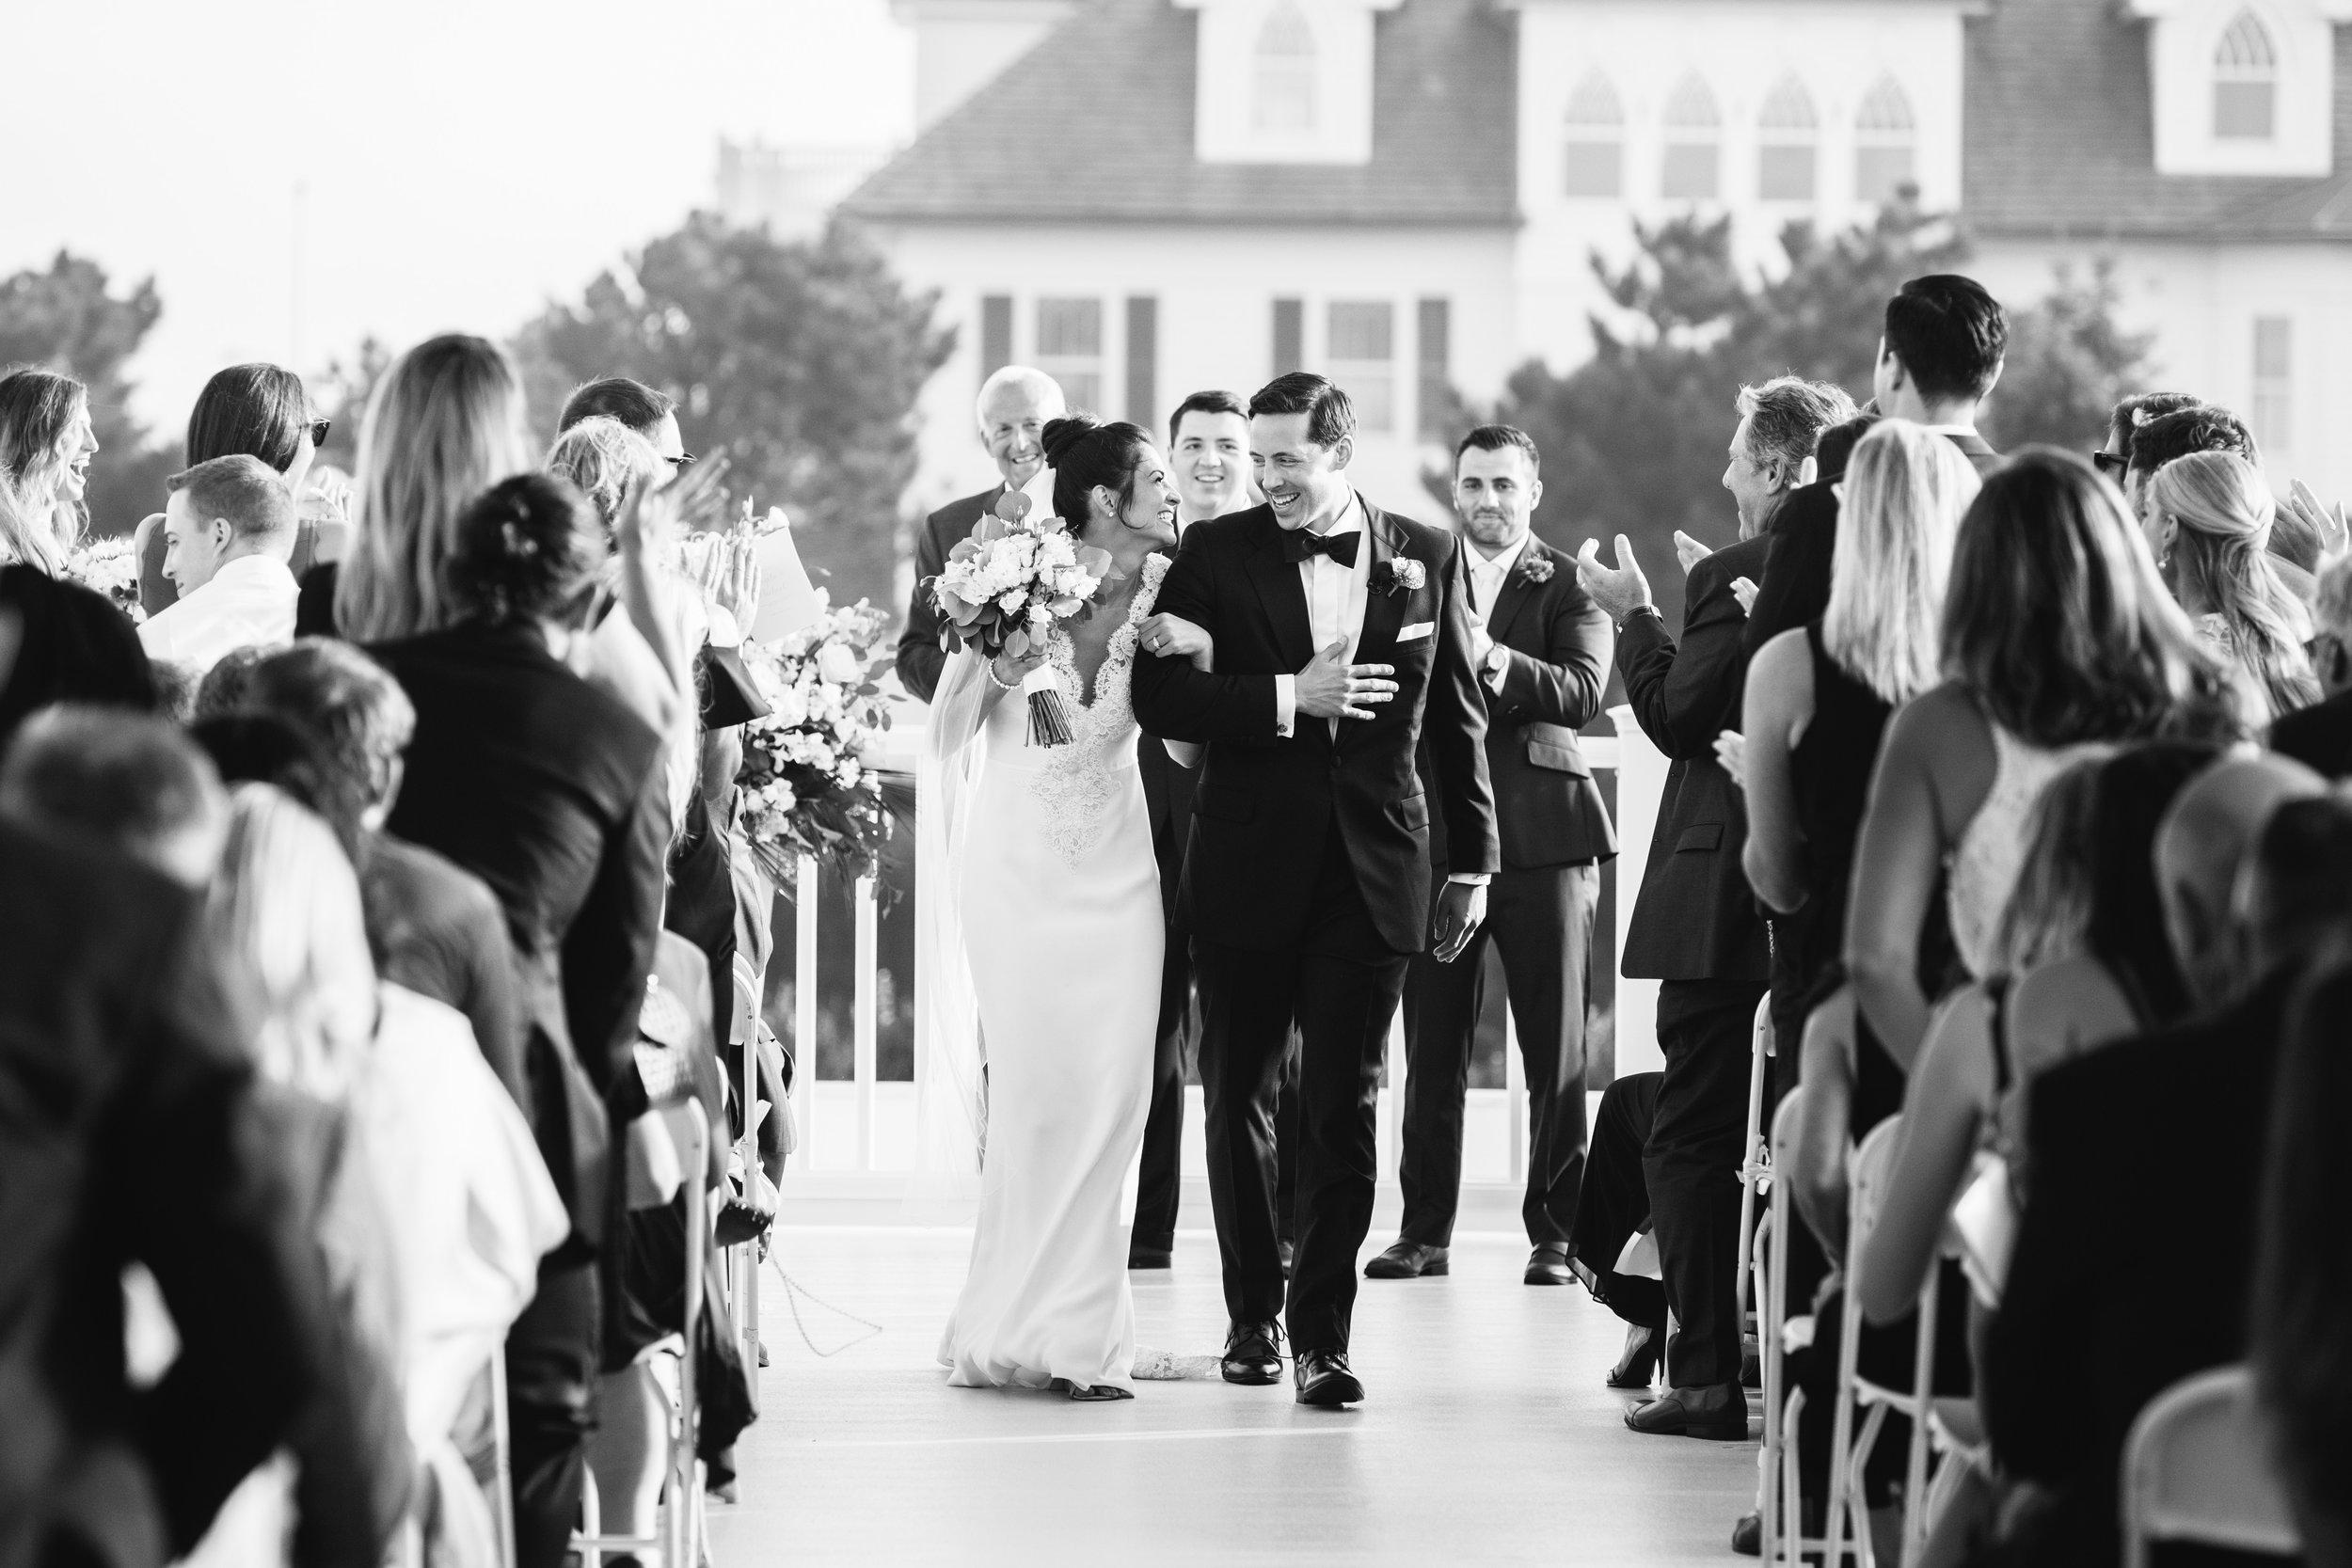 Spring-Lake-New-Jersey-Beach-Wedding-Photographer_292.jpg